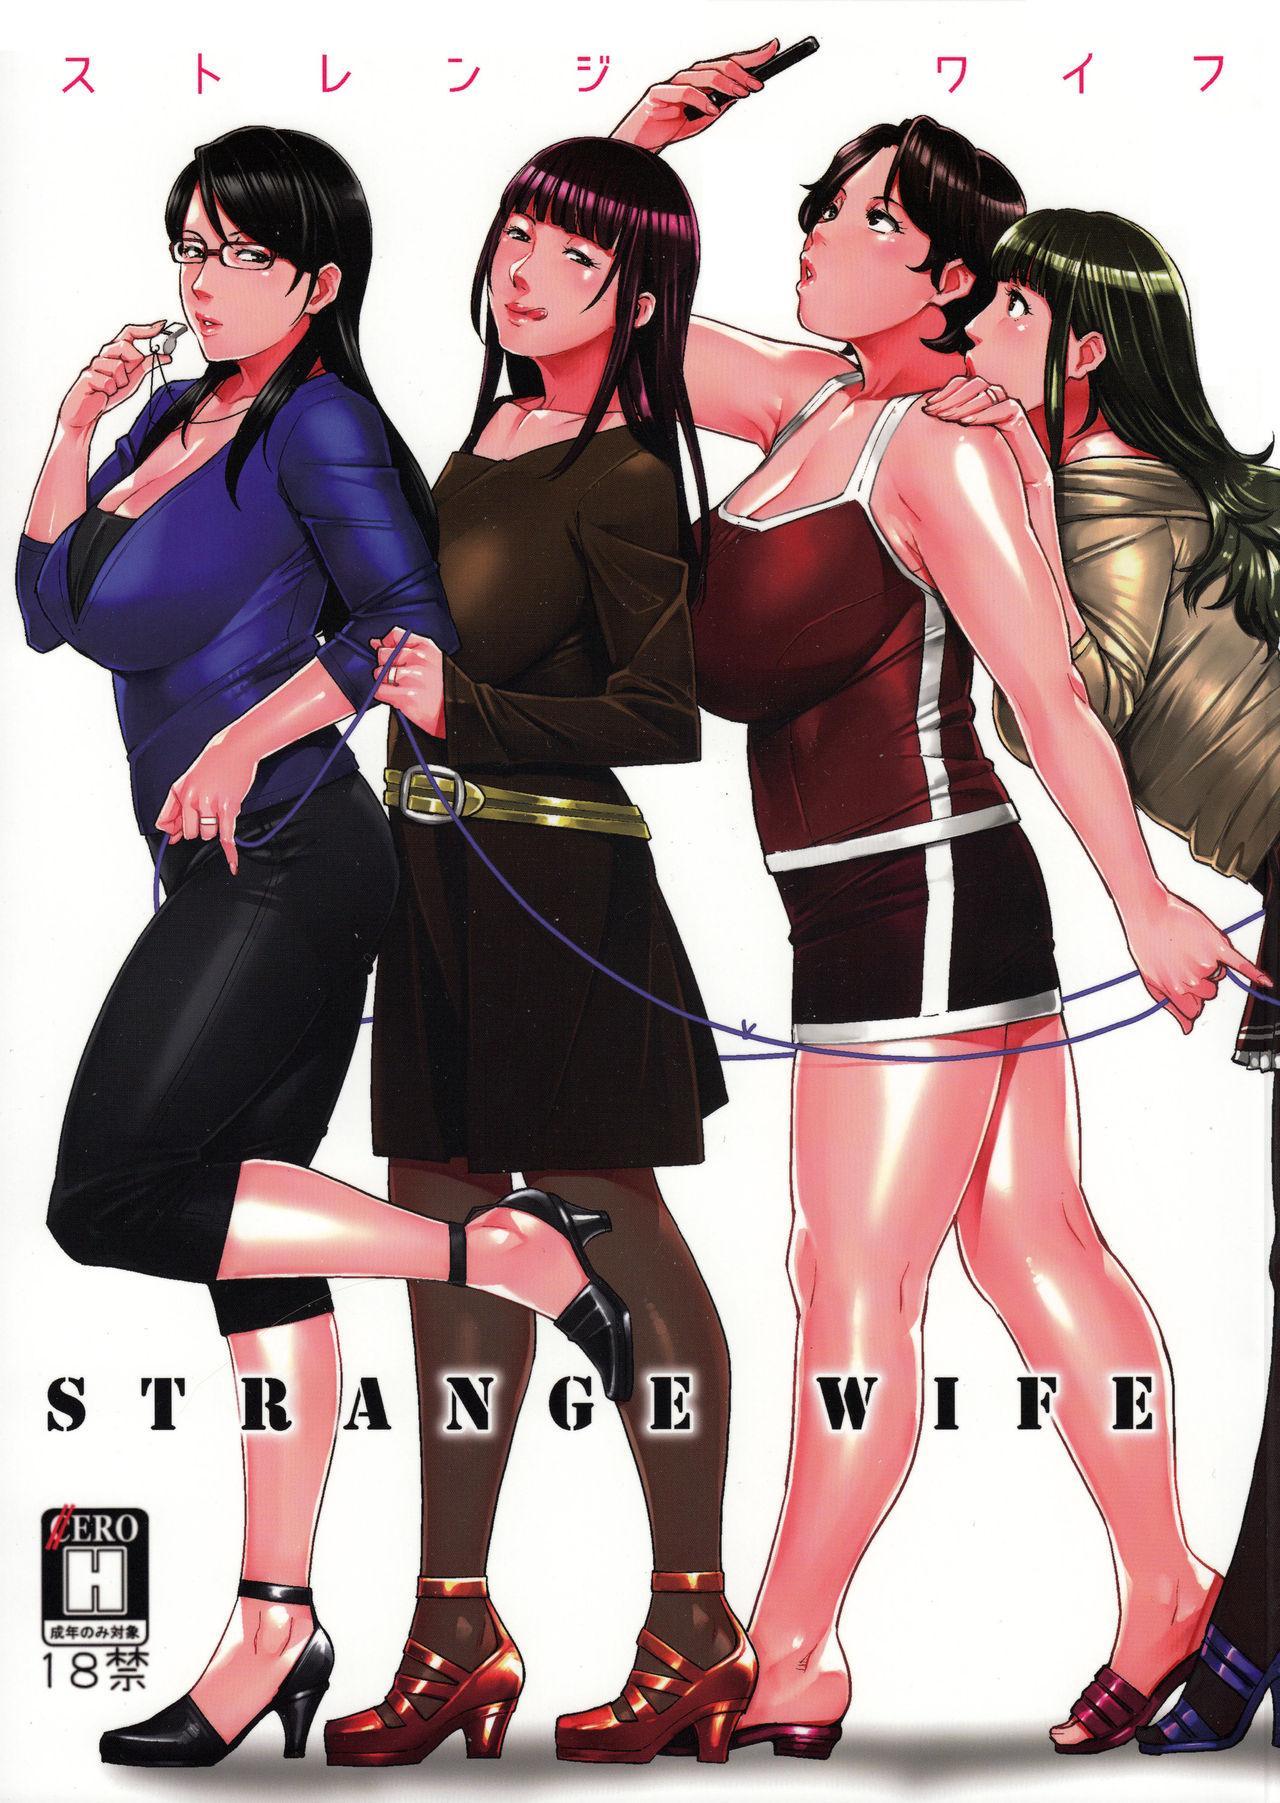 STRANGE WIFE 0